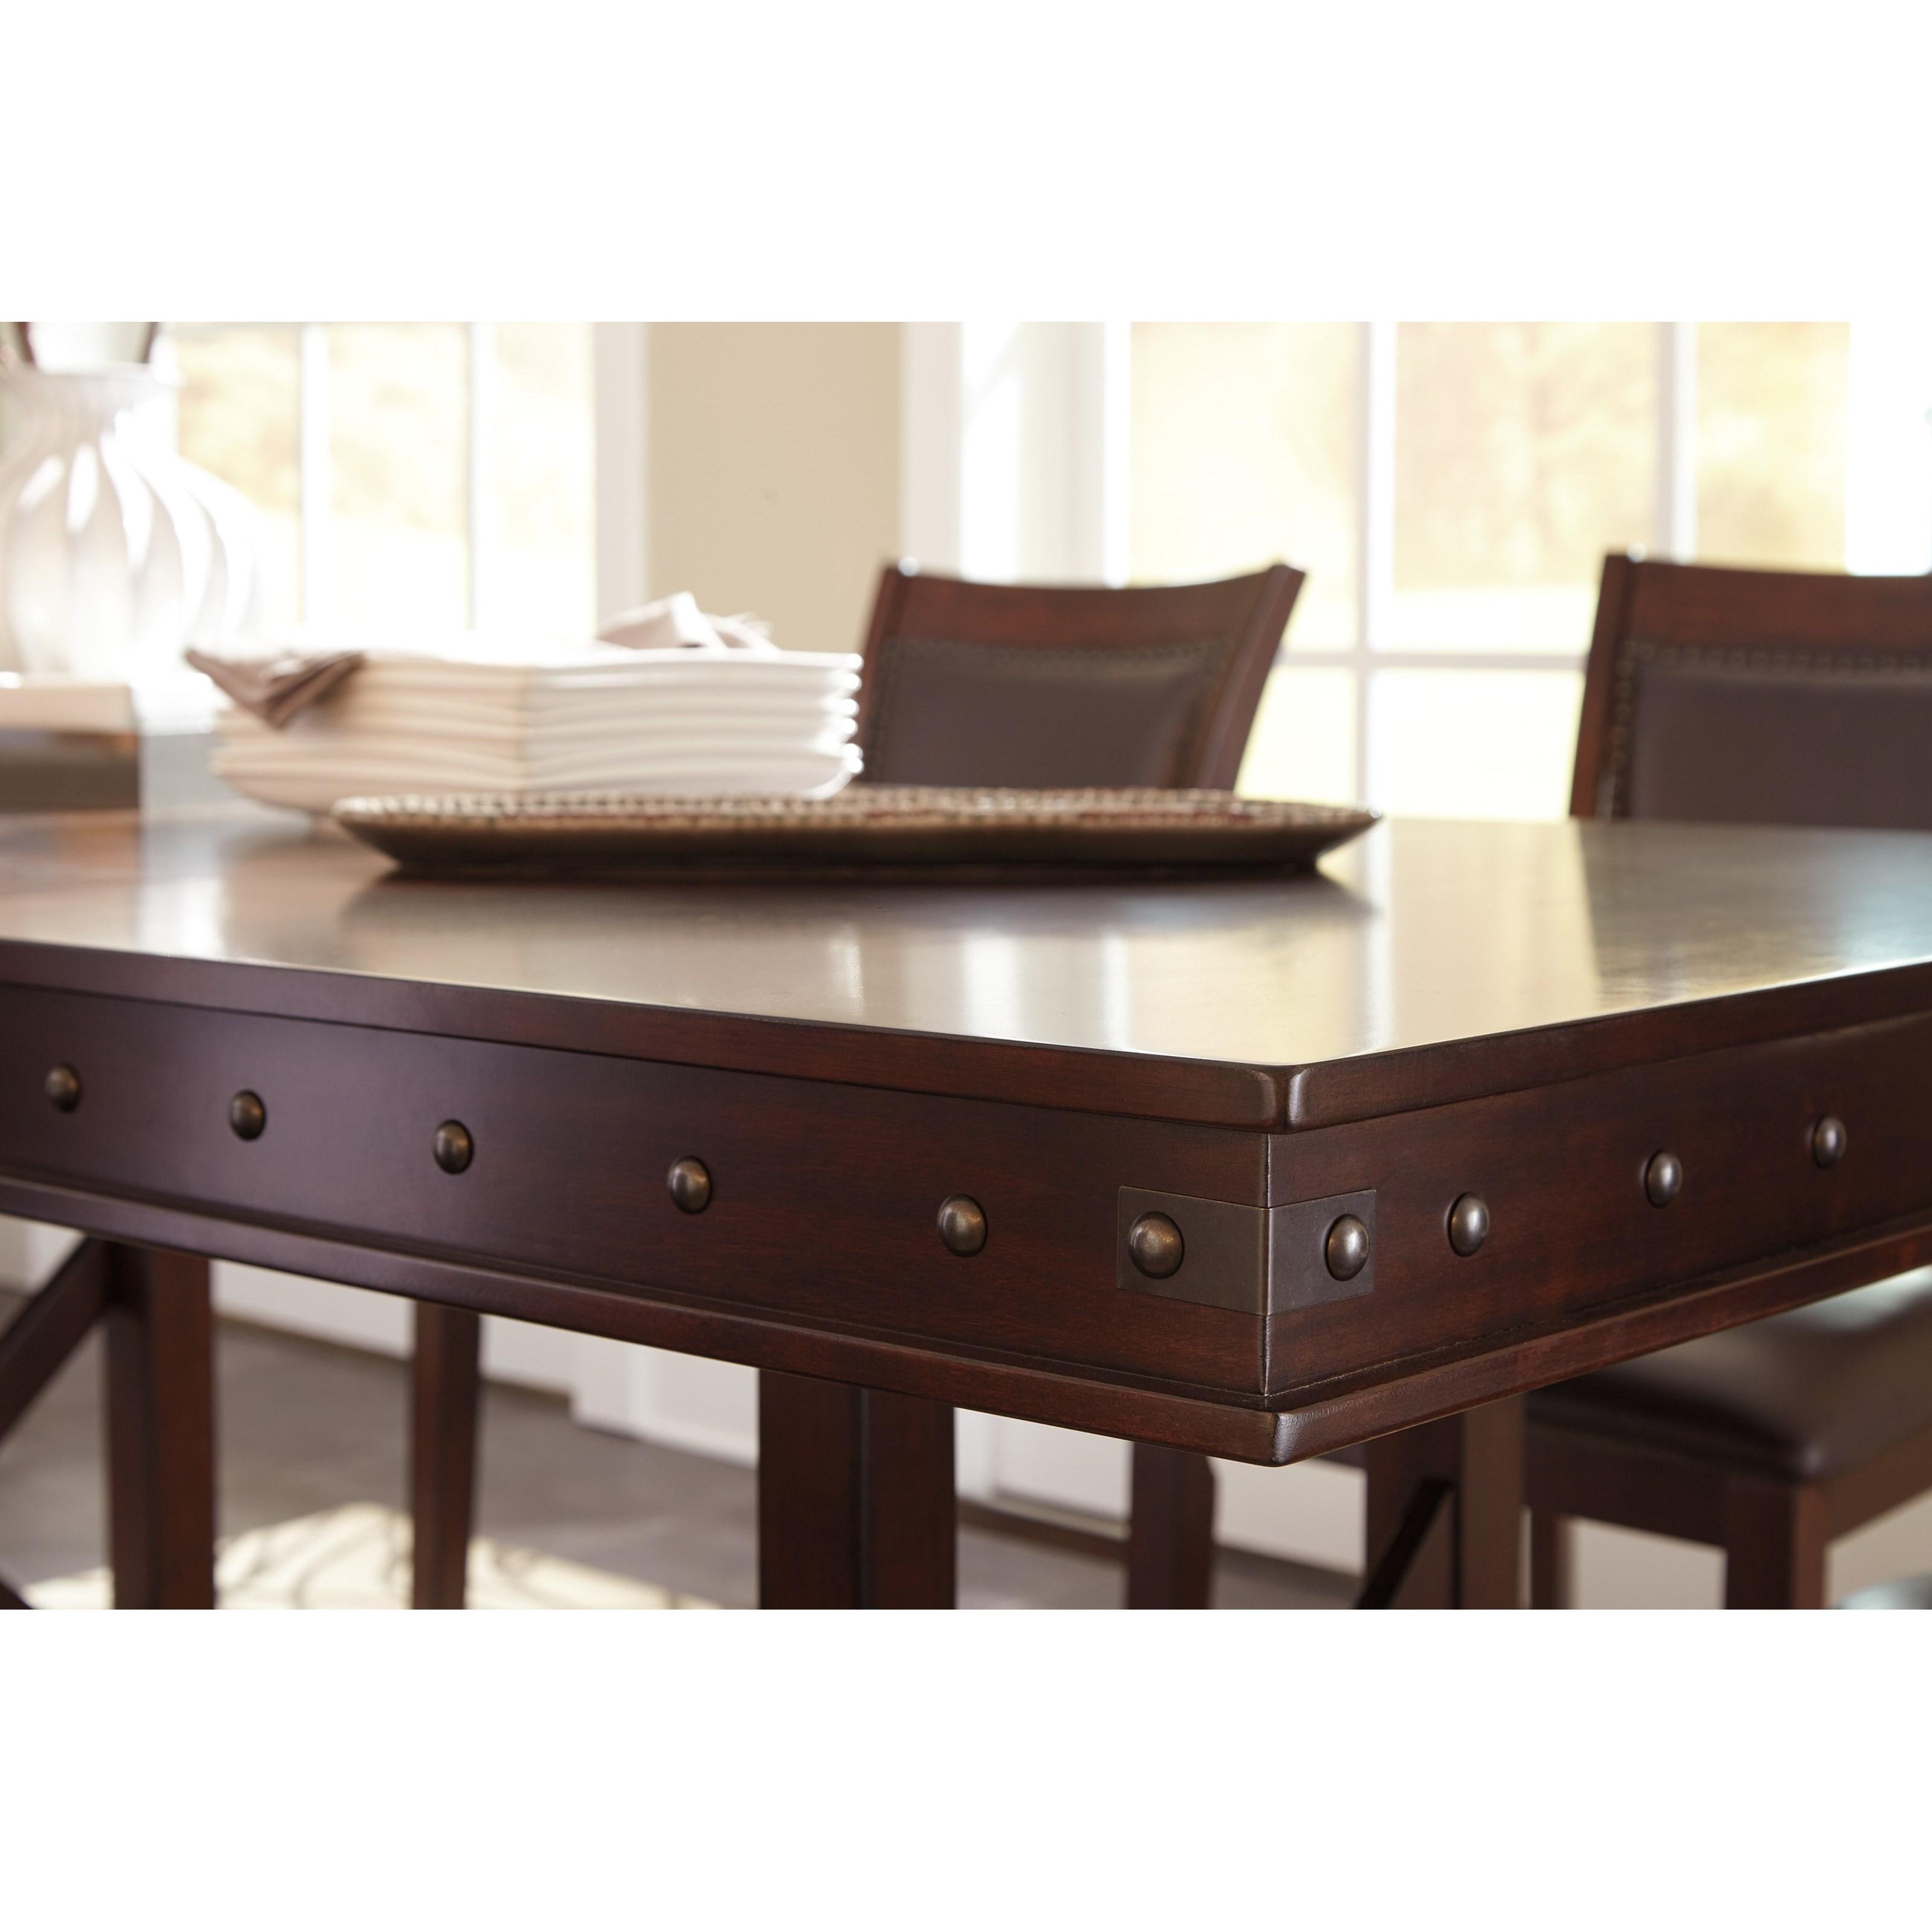 Ashley Signature Design Collenburg 7 Piece Counter Table  : products2Fsignaturedesignbyashley2Fcolor2Fcollenburgd564 322B6x124 b11 from www.dunkandbright.com size 3200 x 3200 jpeg 567kB